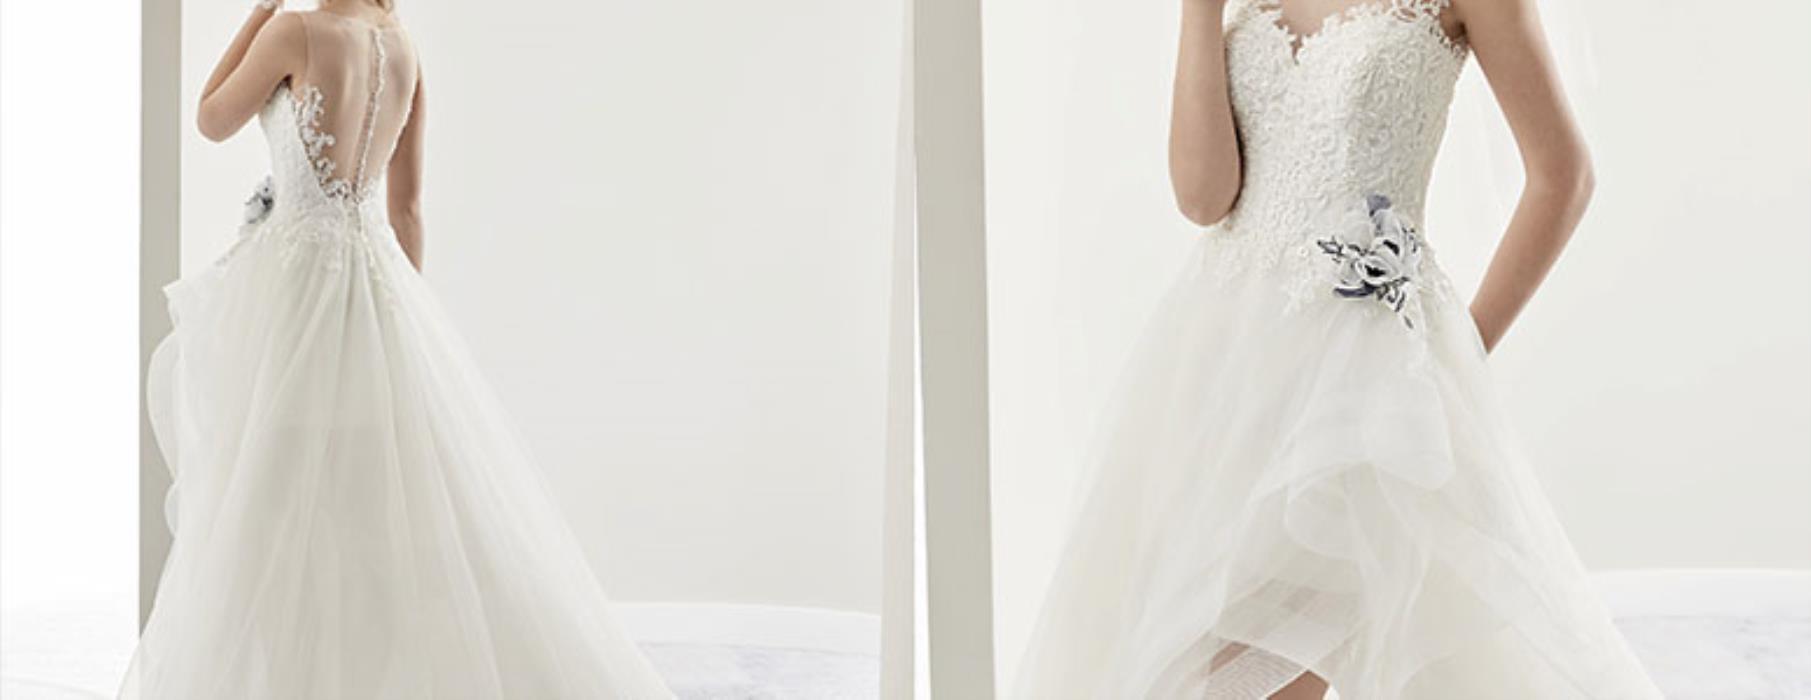 Vestiti Da Sposa Jolies.Abiti Da Sposa Jolies Clara Couture